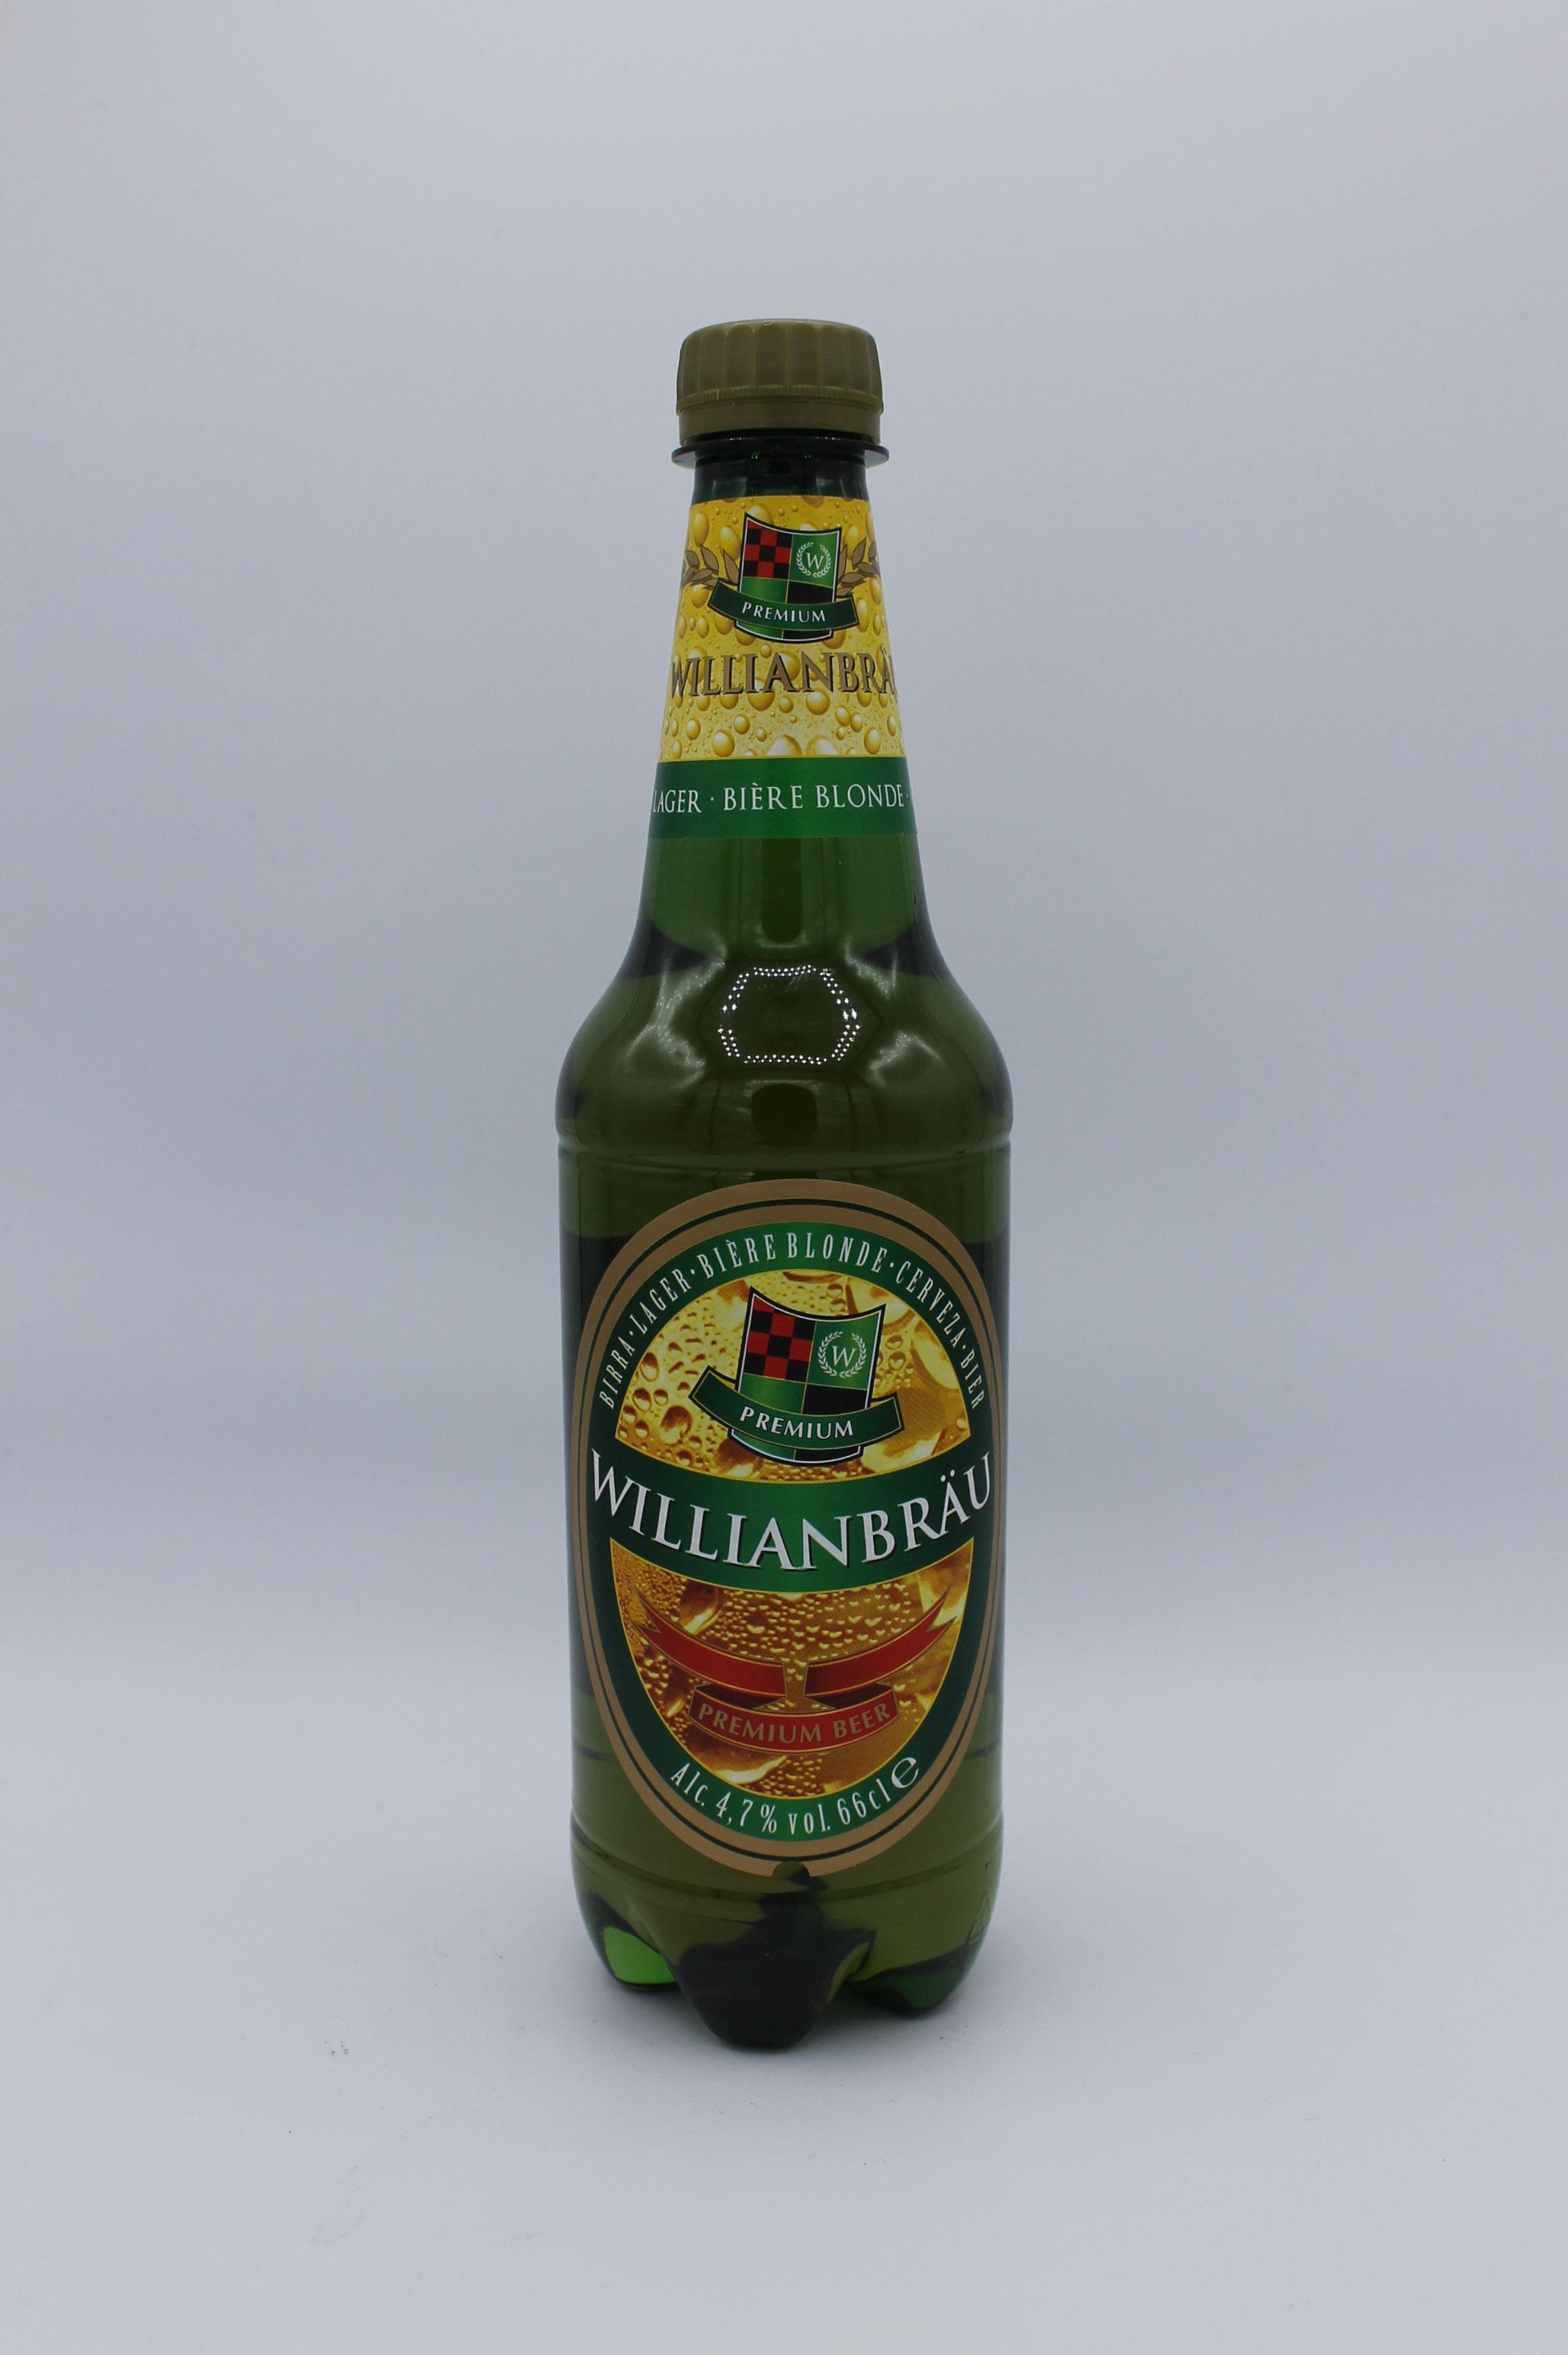 Willianbrau birra bottiglia 660ml.